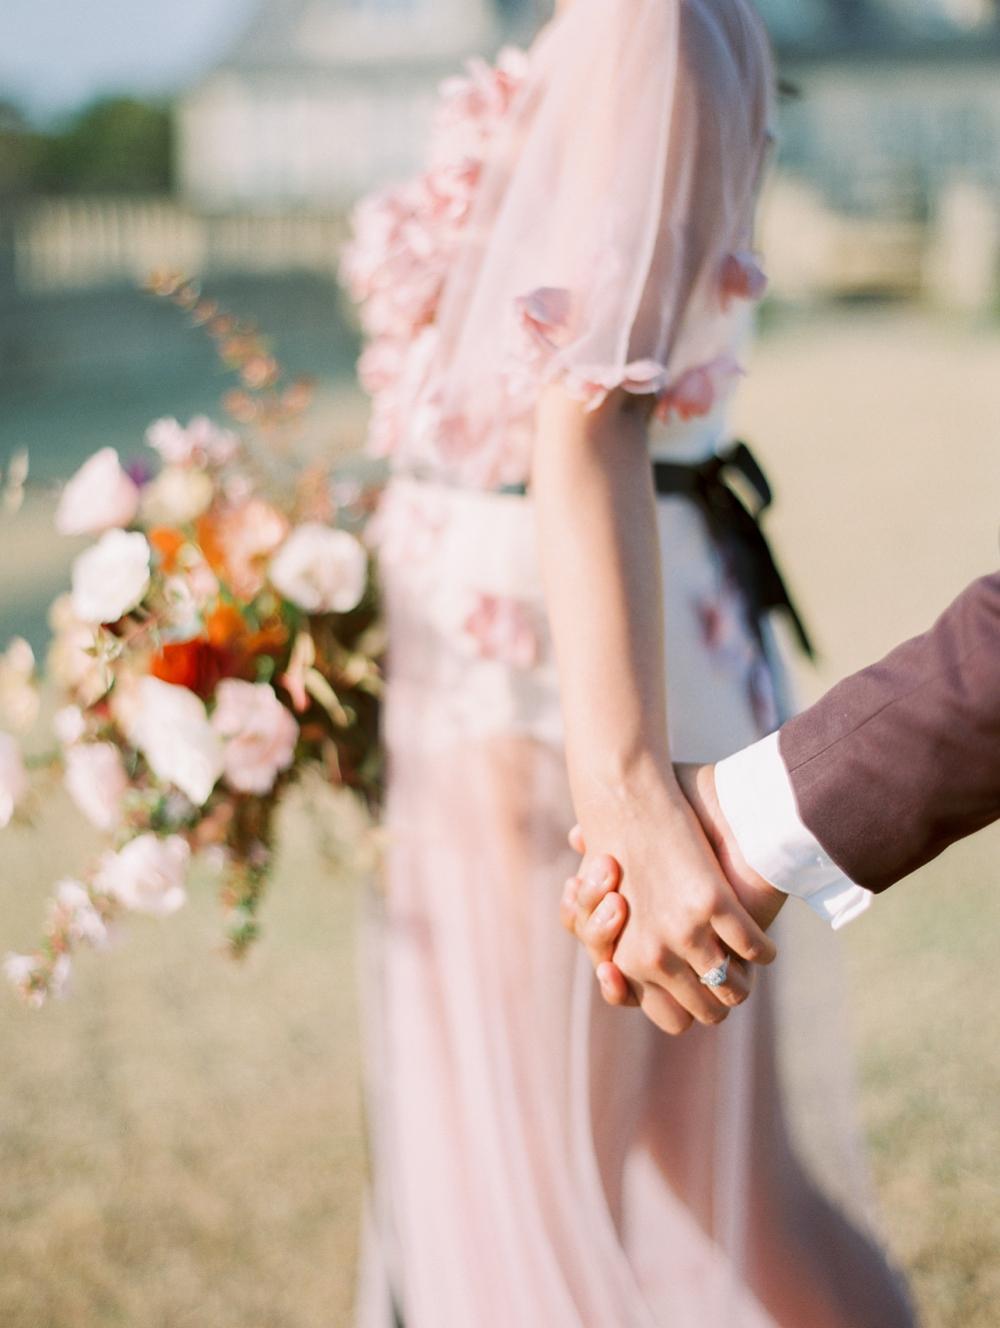 kristin-la-voie-photography-TEXAS-Wedding-Photographer-THE-OLANA-DALLAS-FINE-ART-33